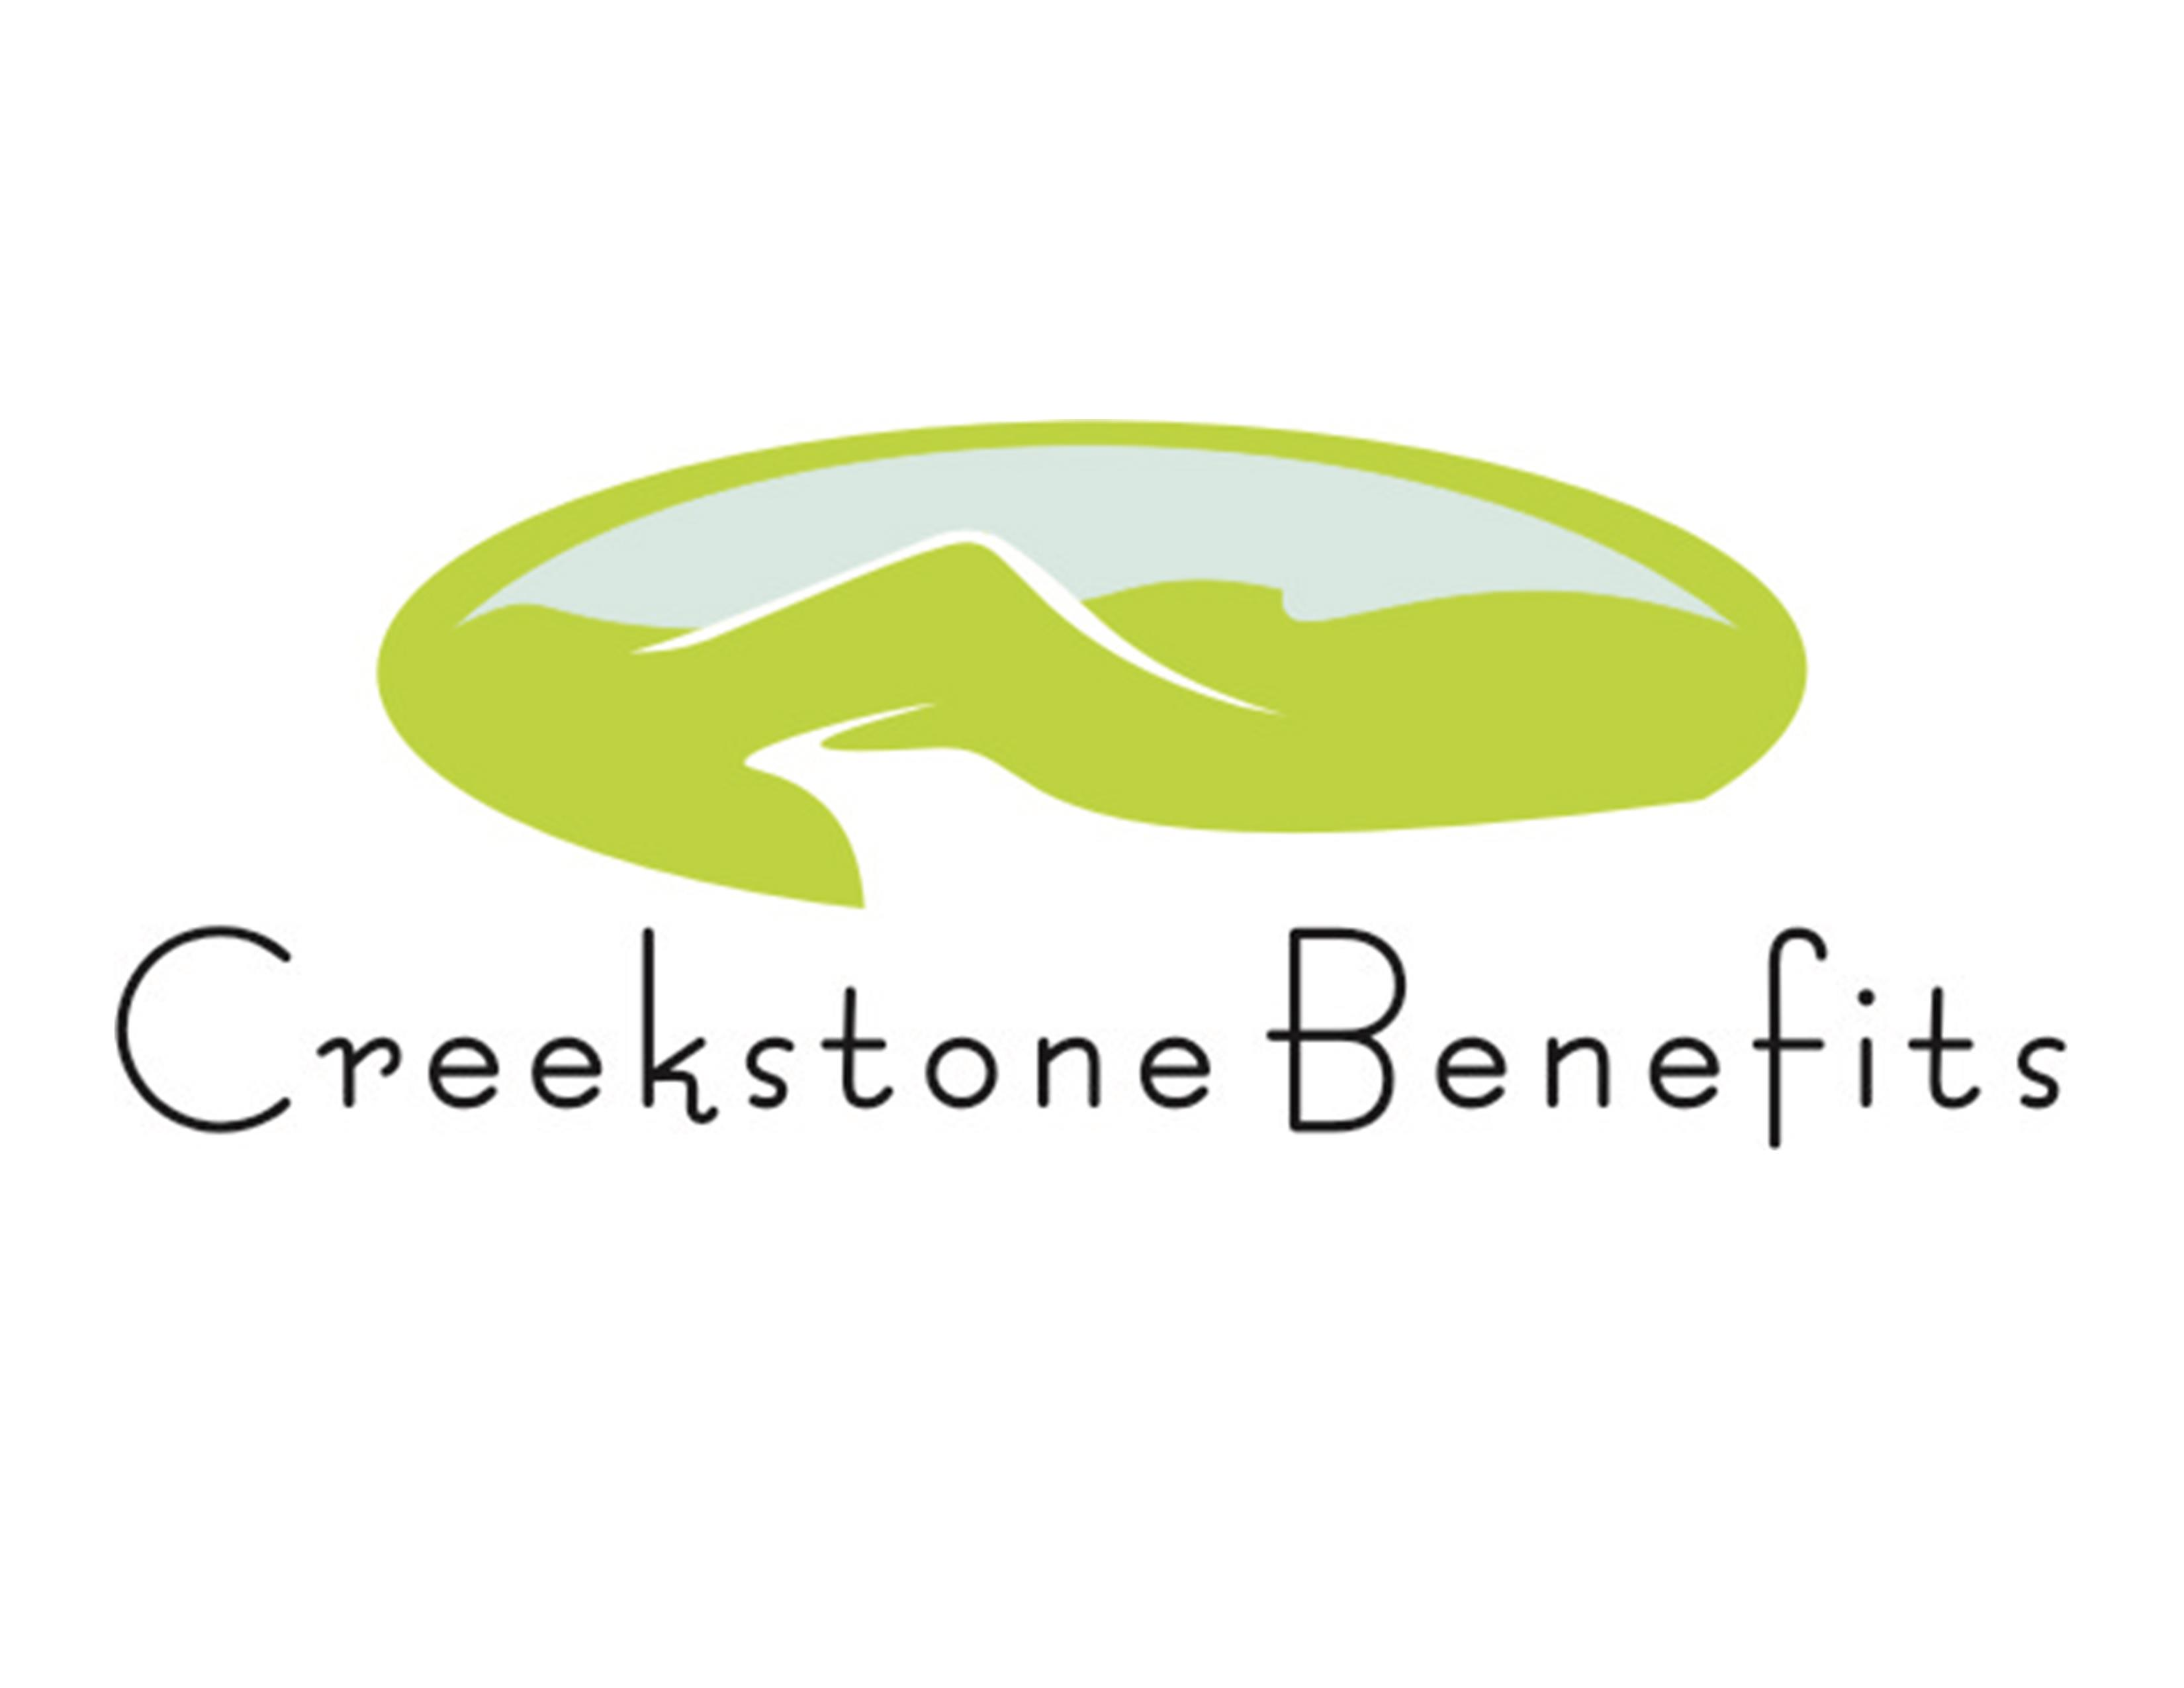 Creekstone Benefits social